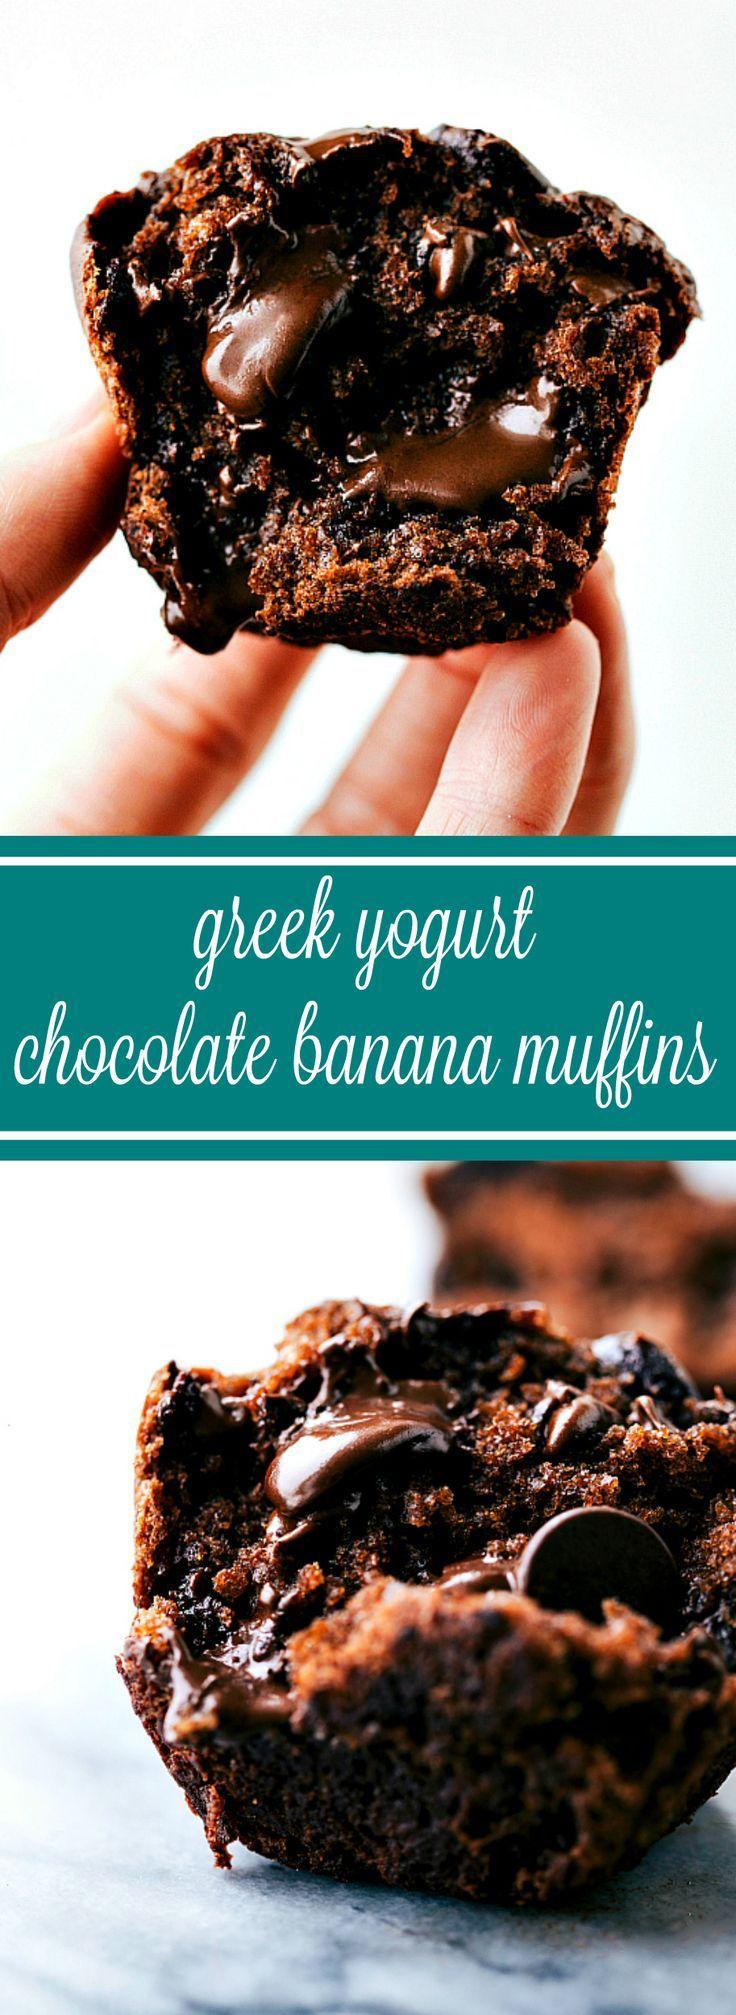 Delicious Bakery Style Greek Yogurt Chocolate Banana Muffins